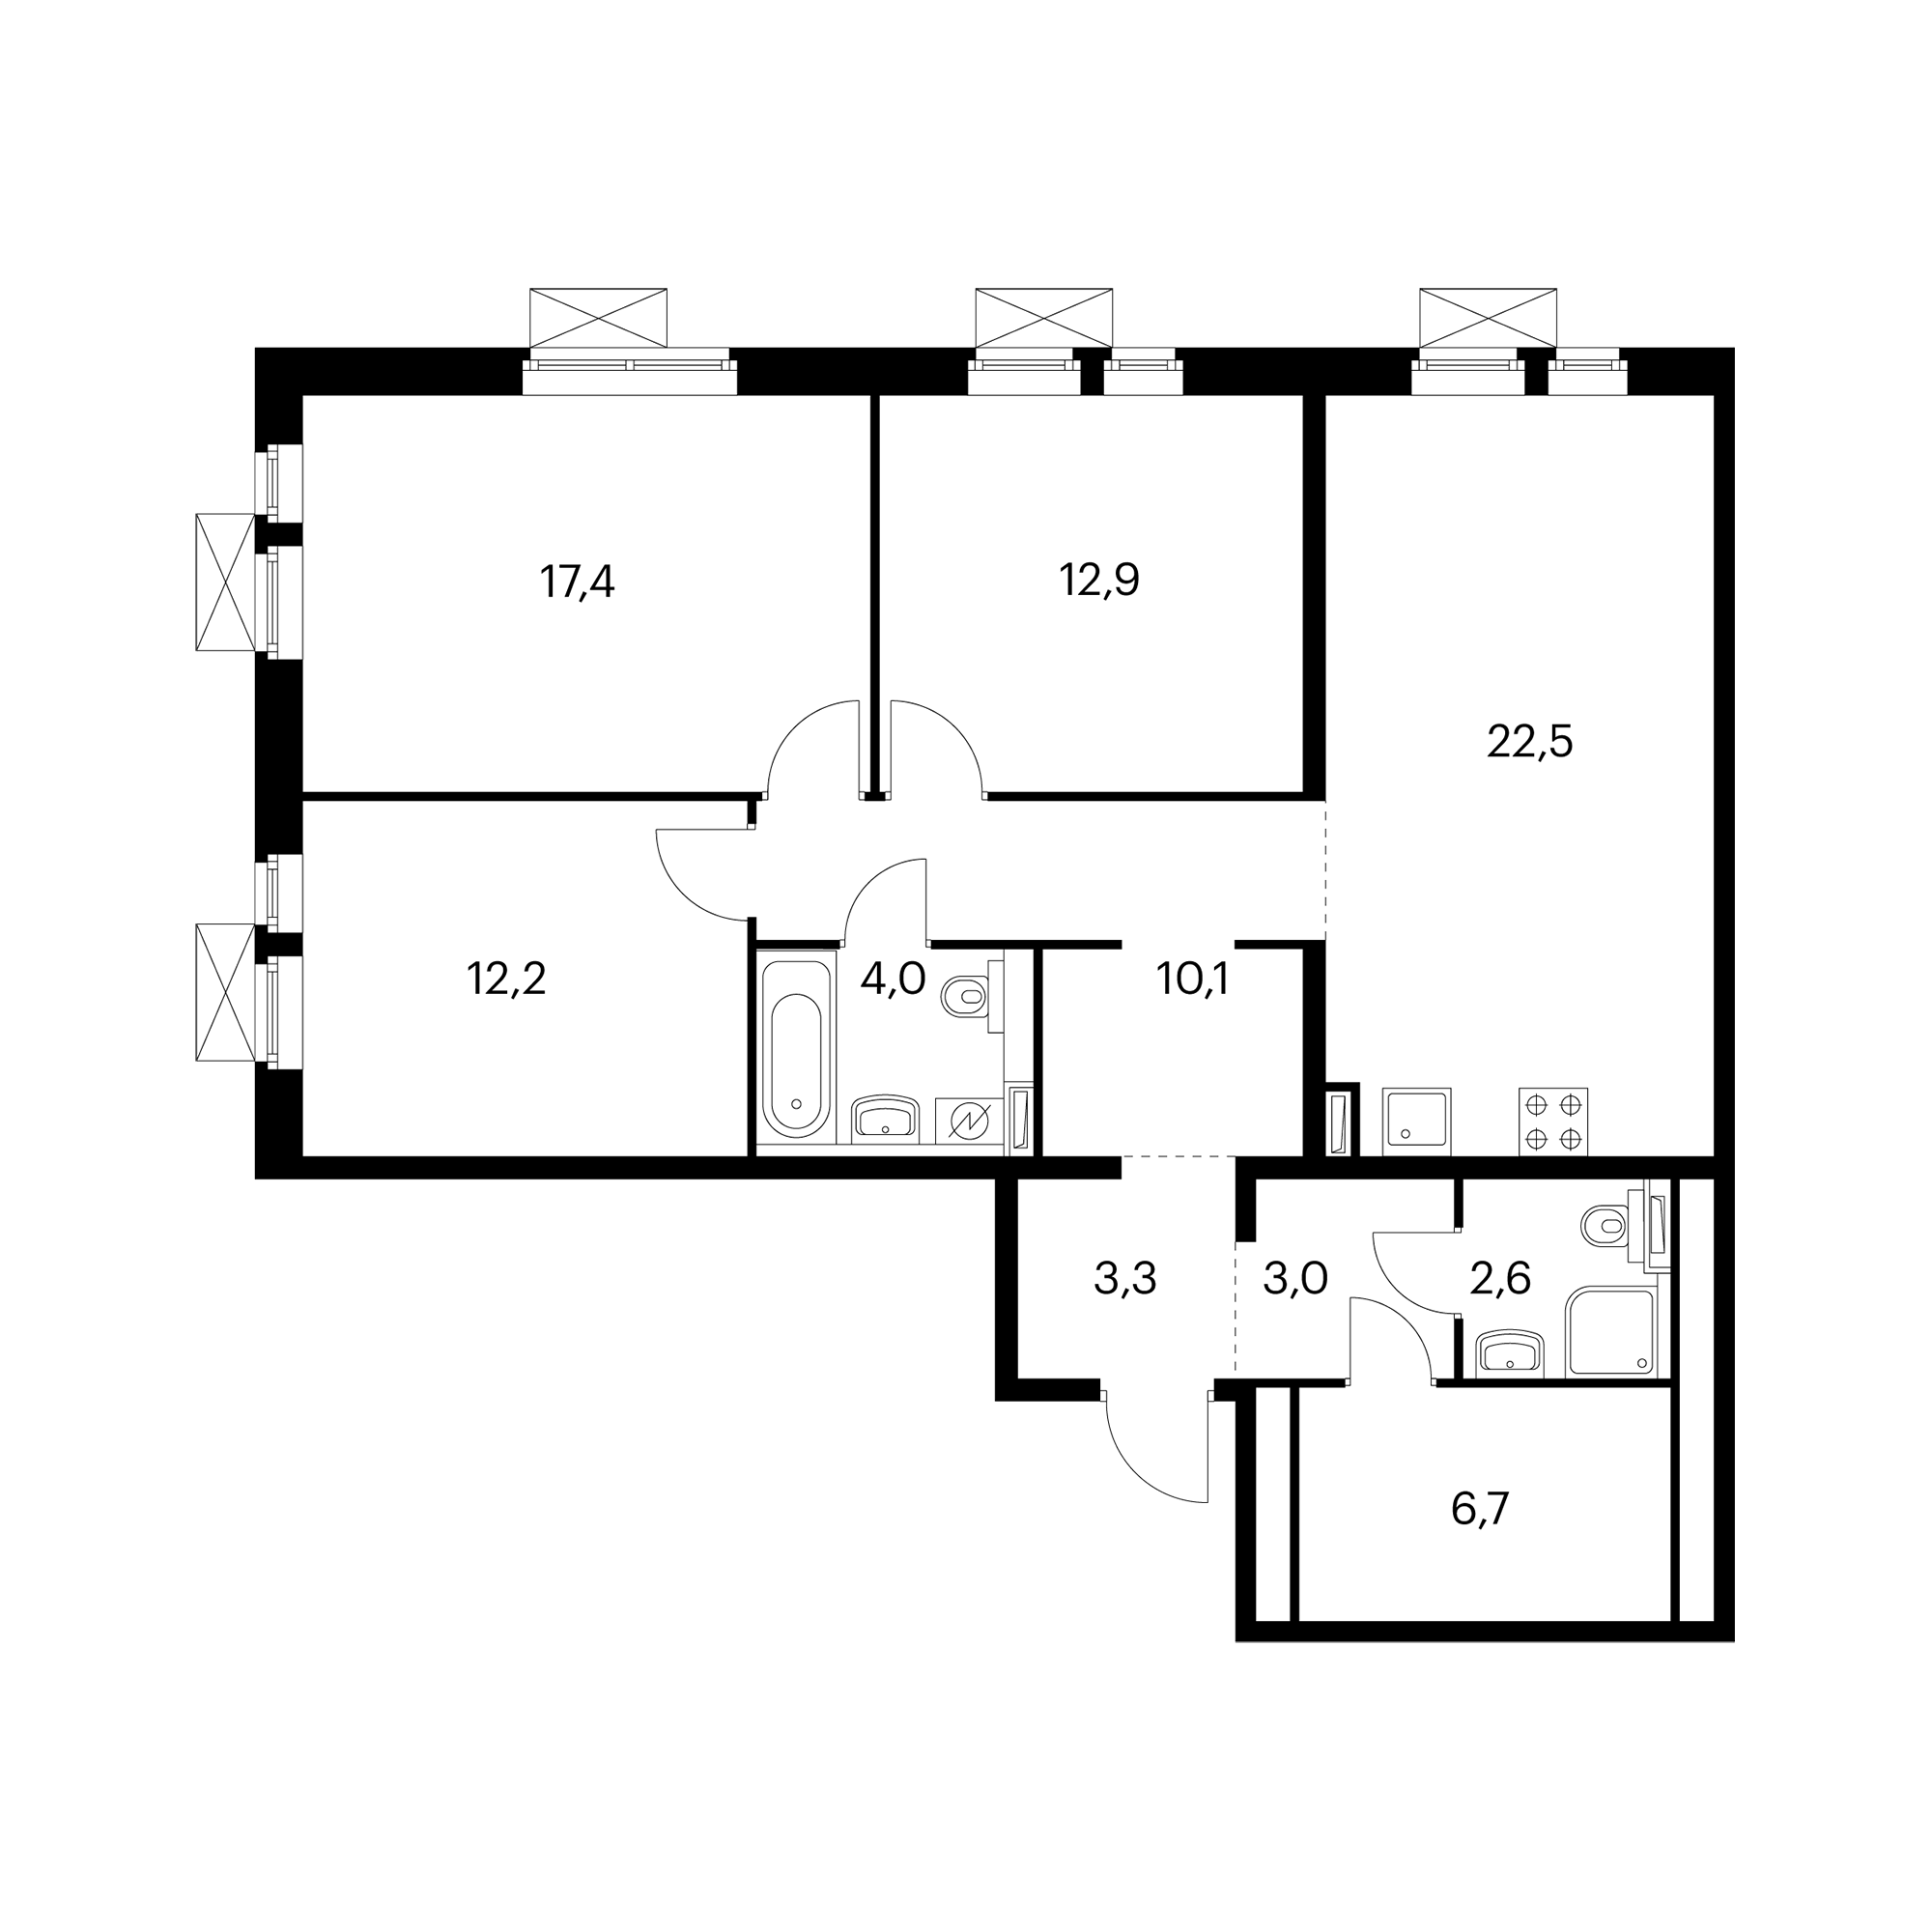 3EL23_10.8-1